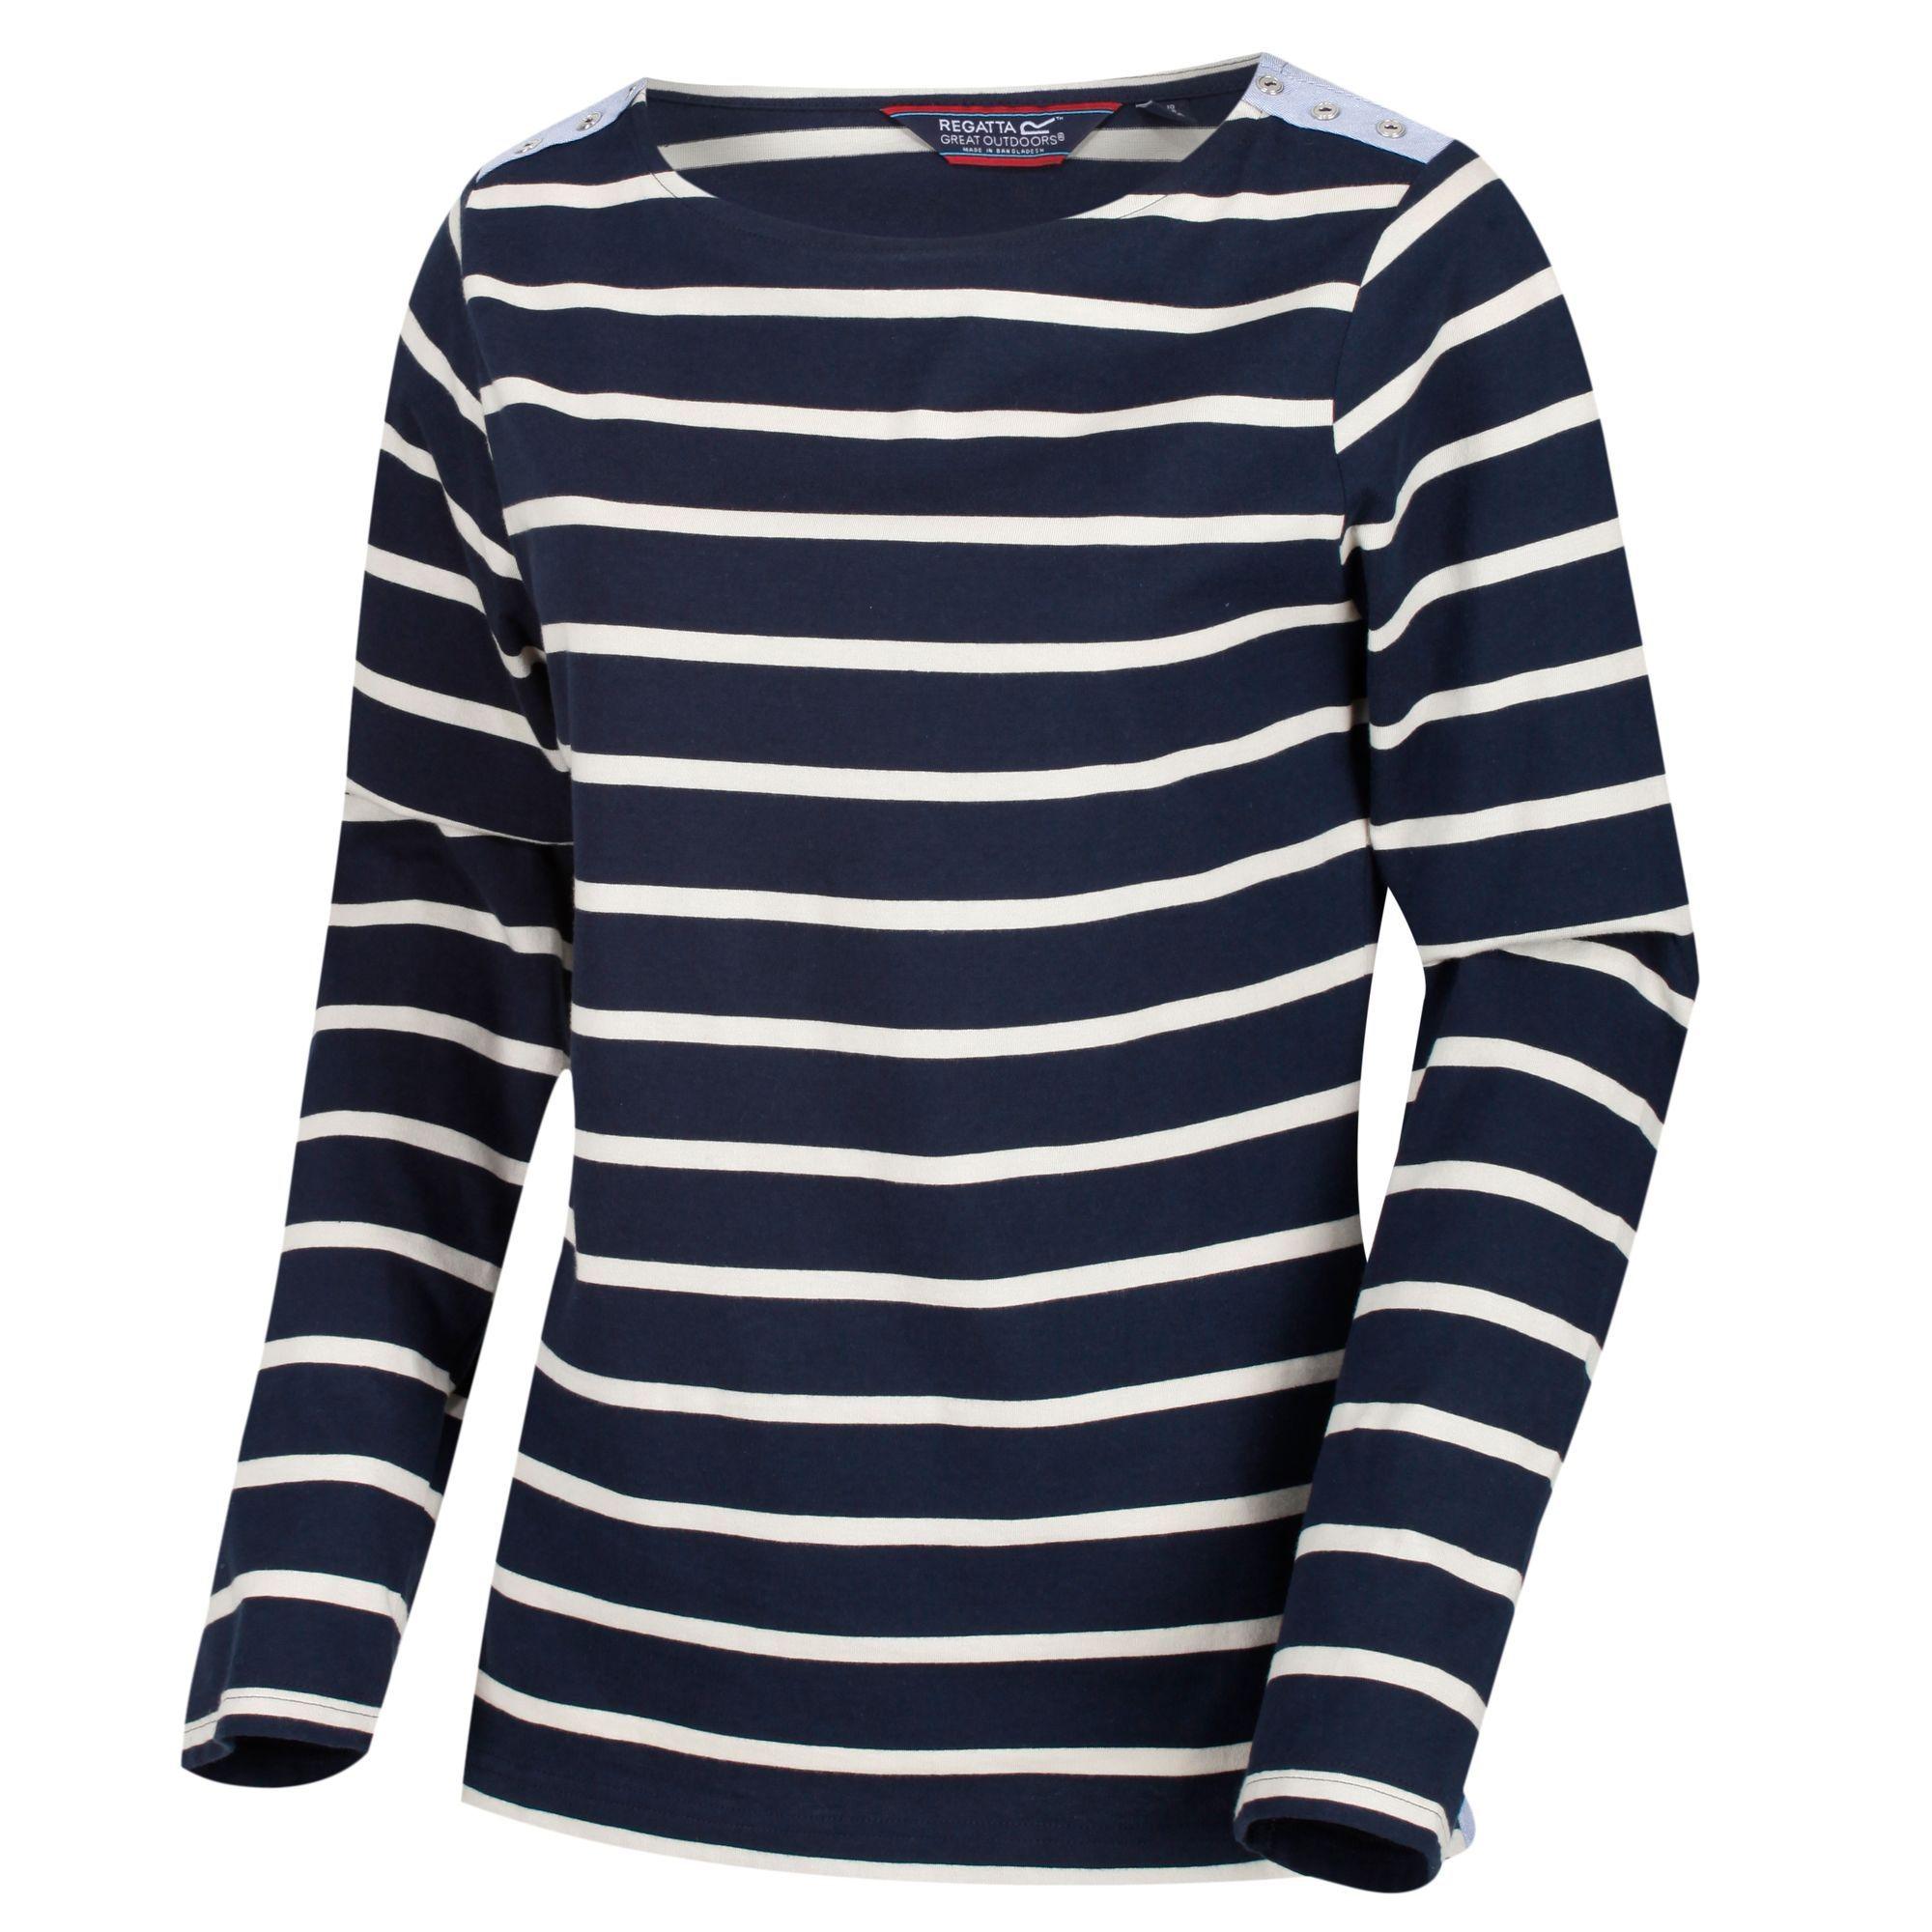 Regatta Womens/Ladies Flordelis Striped Long Sleeve T-Shirt